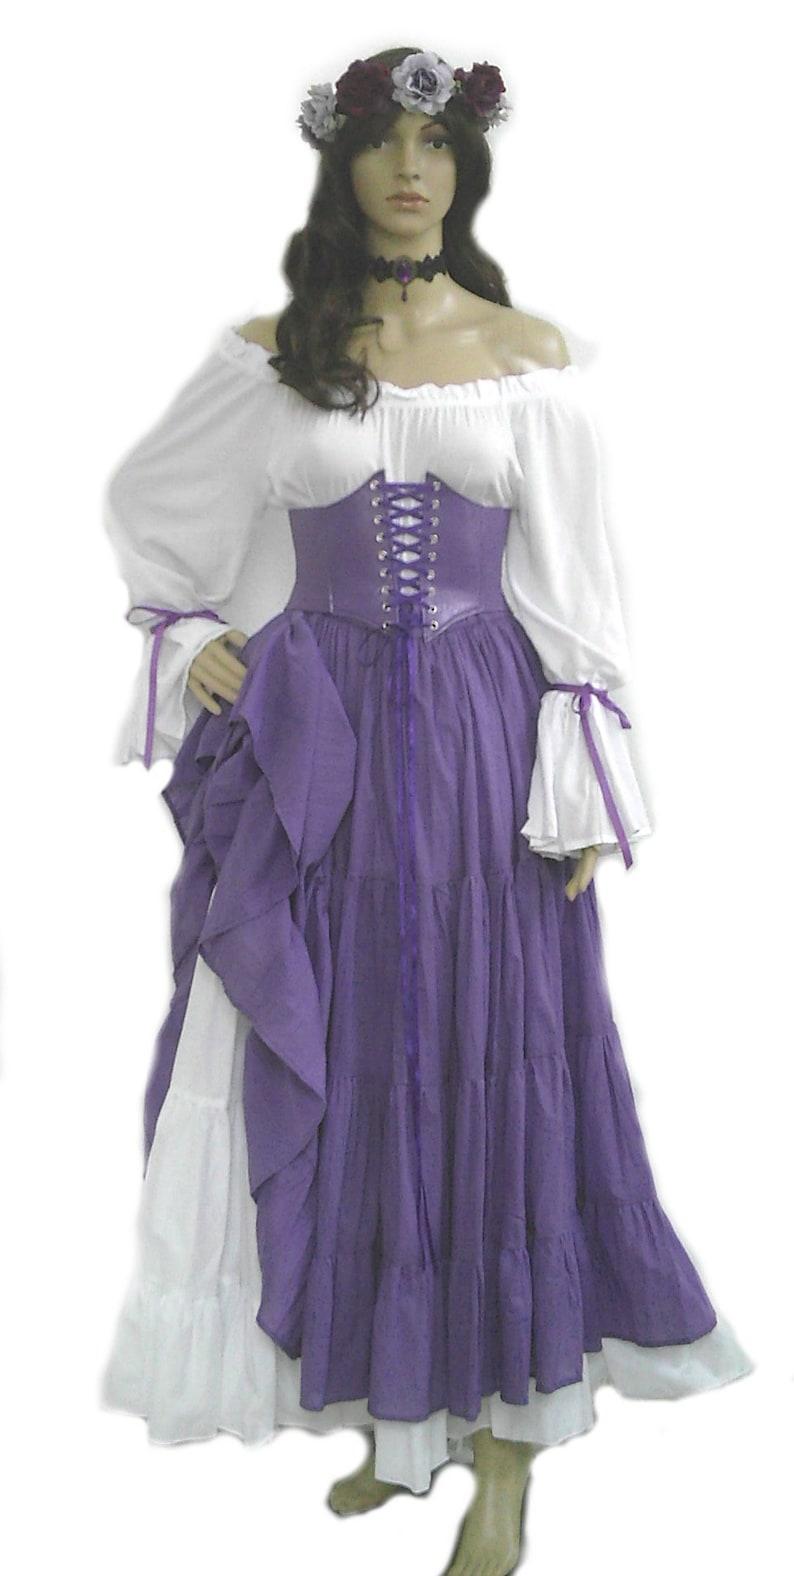 b8fb8d11 Renaissance Dress Corset Skirt Chemise Wench Pirate Medieval Steampunk  Costume Celtic Cosplay Fair Purple